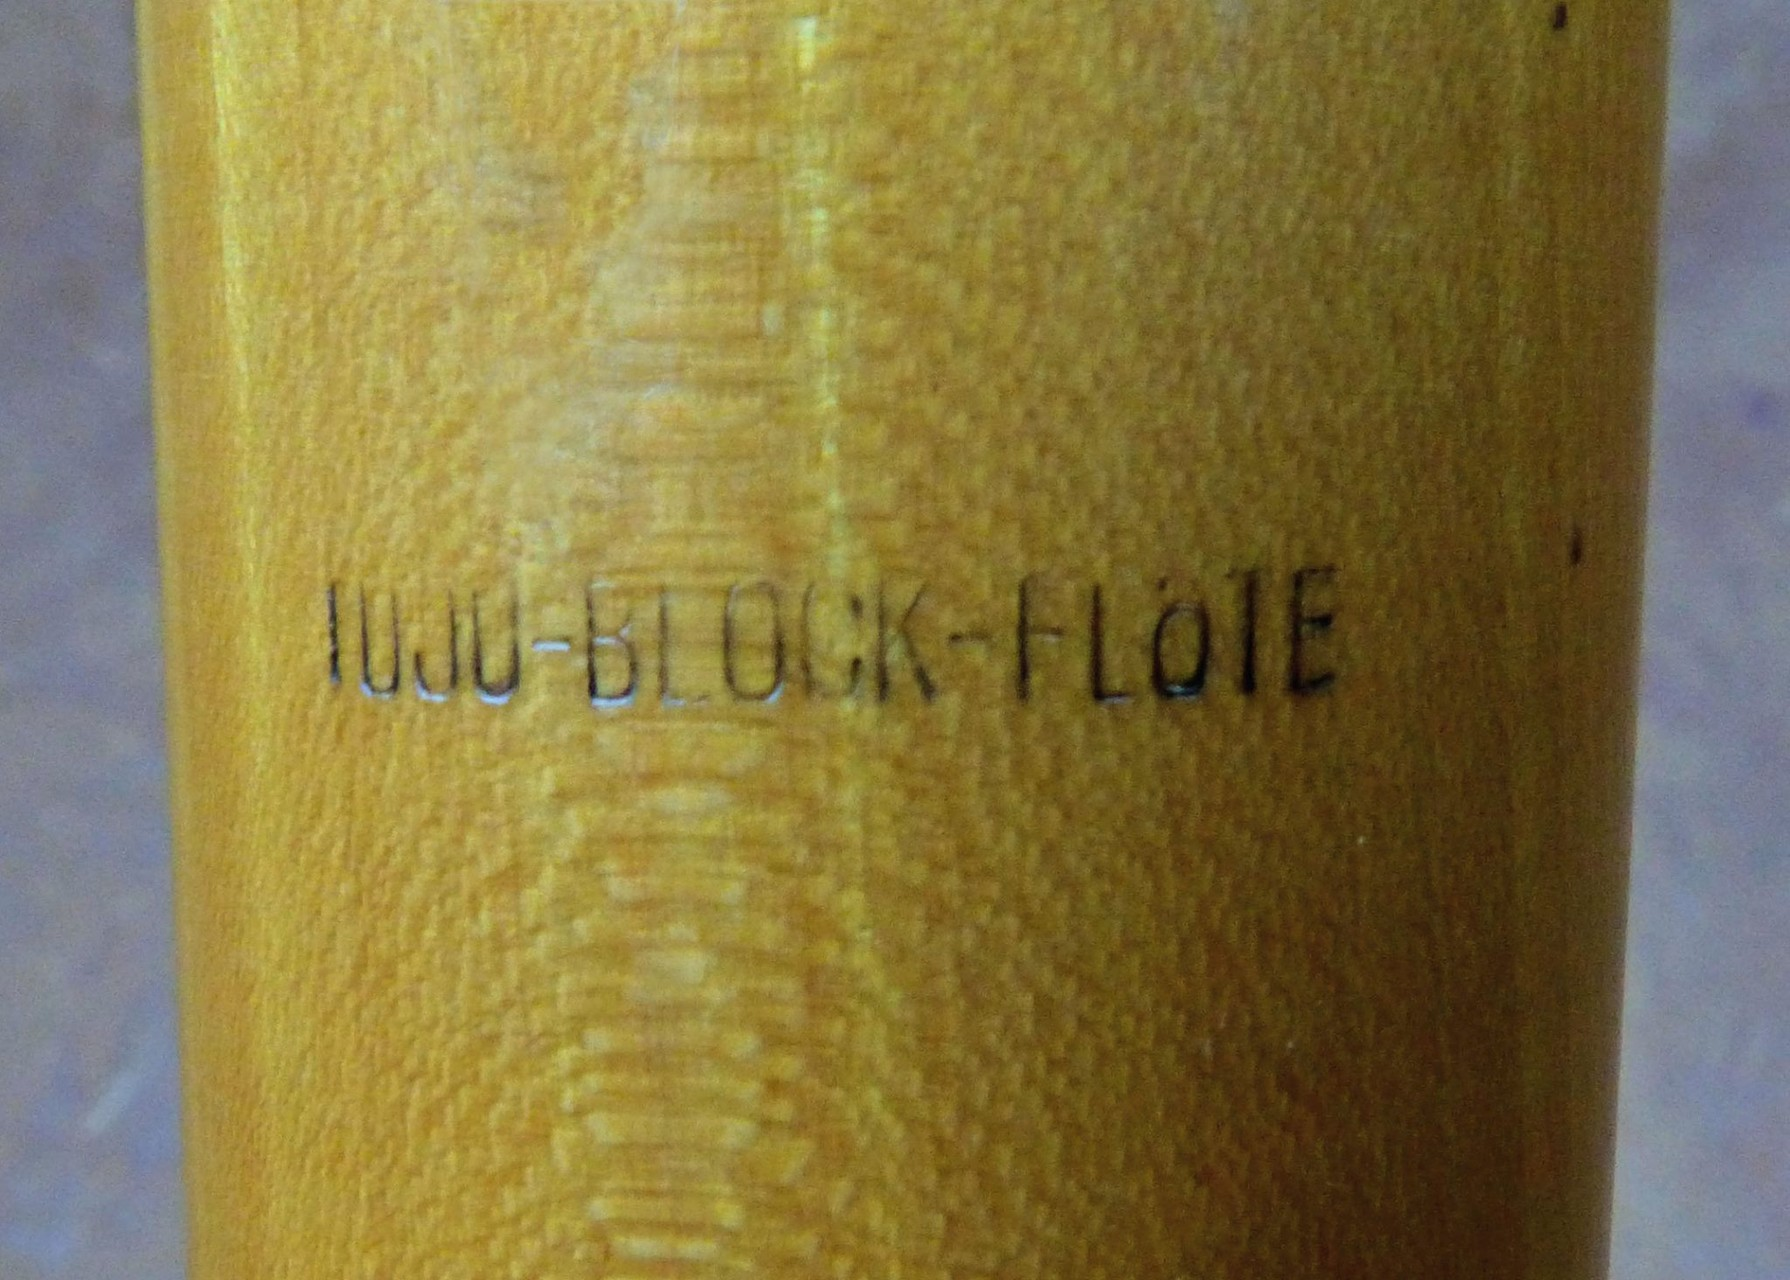 1950 1960 Flauta bajo Moek